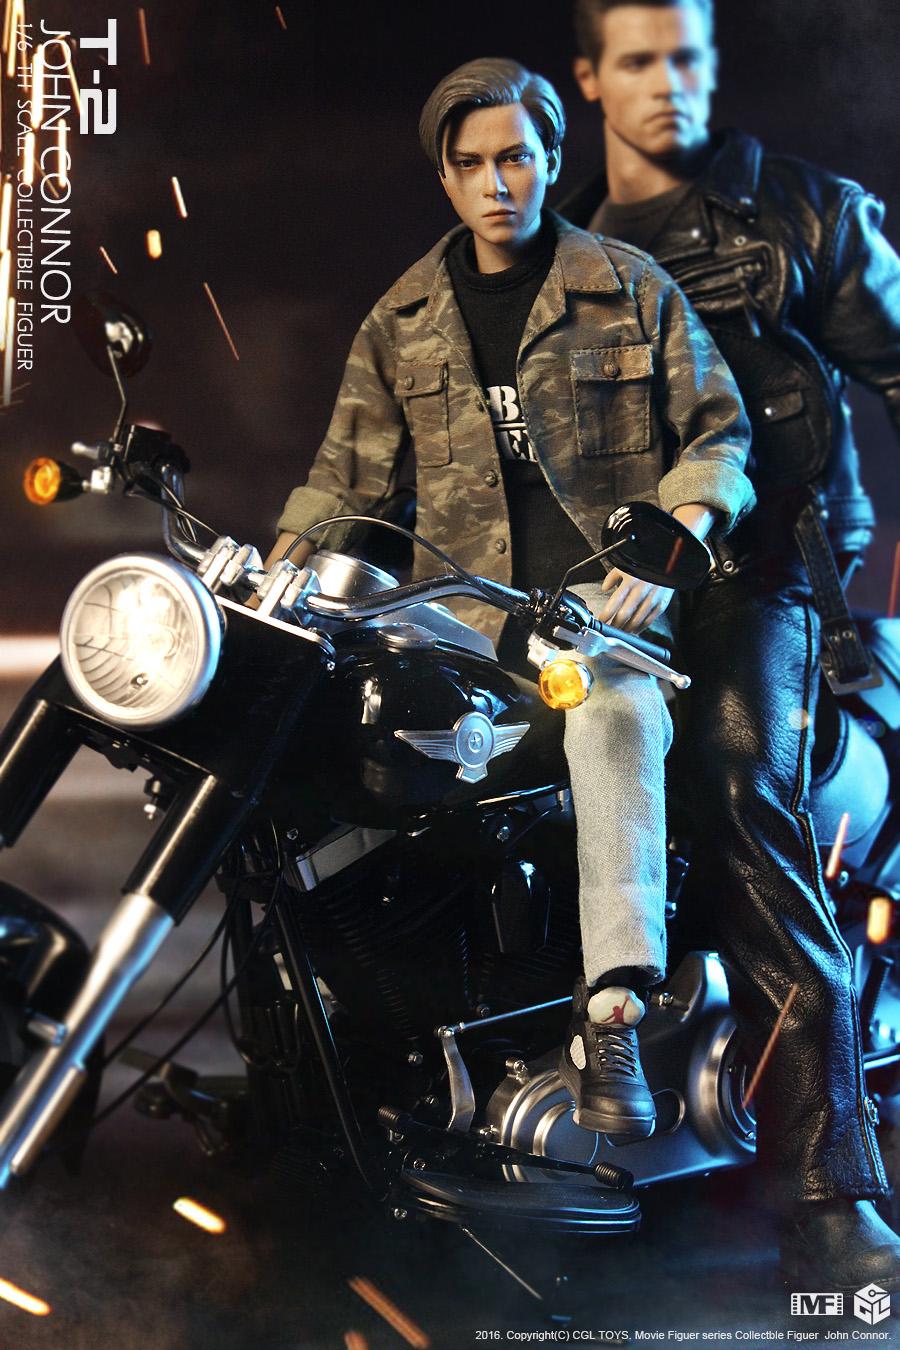 CGL TOYS MF10 Terminator 2 - leader teenager Connor